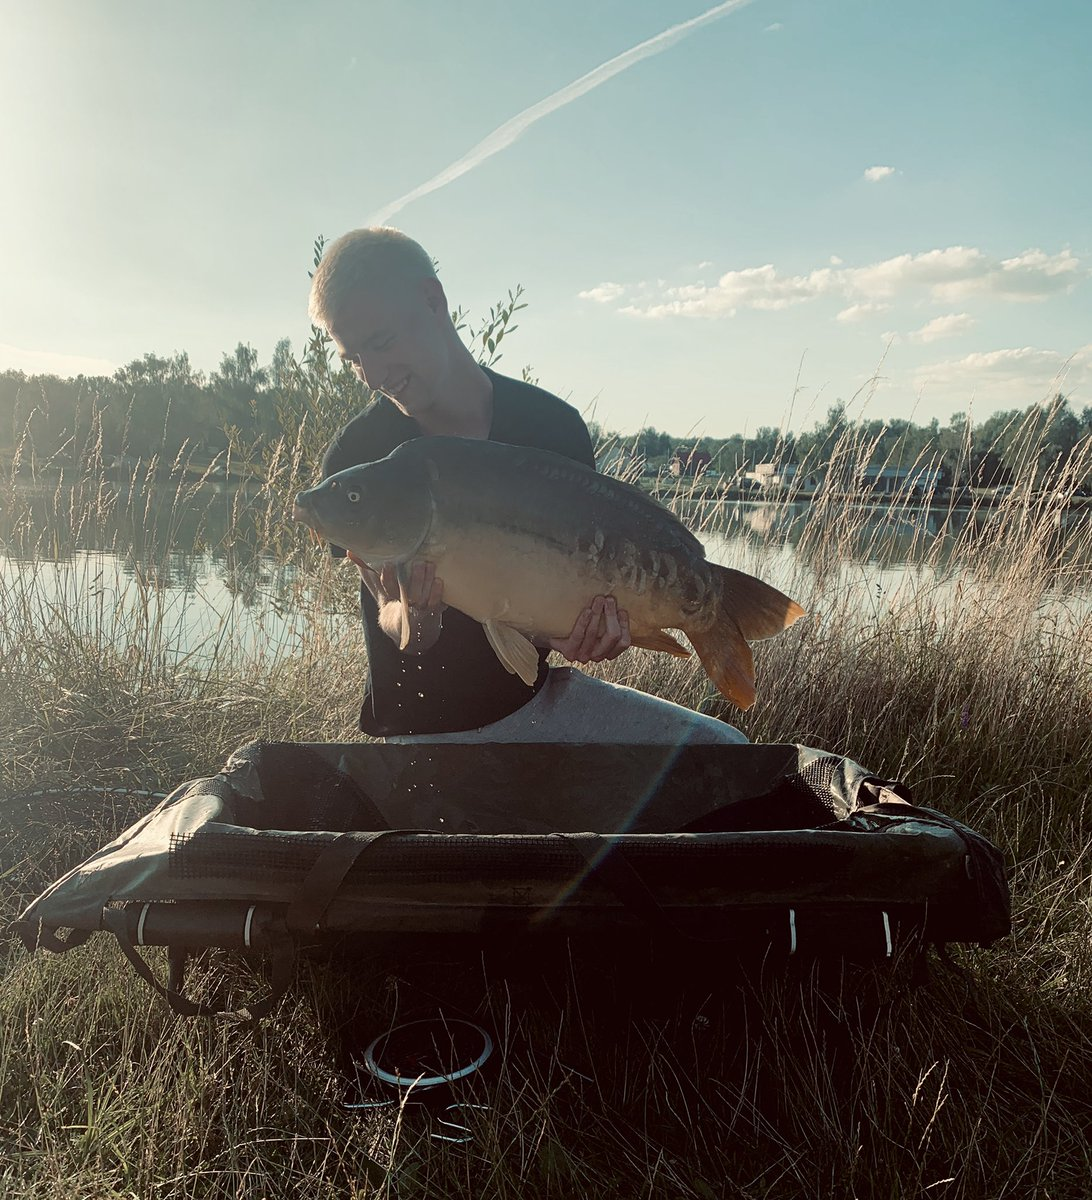 ud83eudd0d #carp #fishing #carpfishing #fun #<b>Love</b> https://t.co/2VkazuRT20